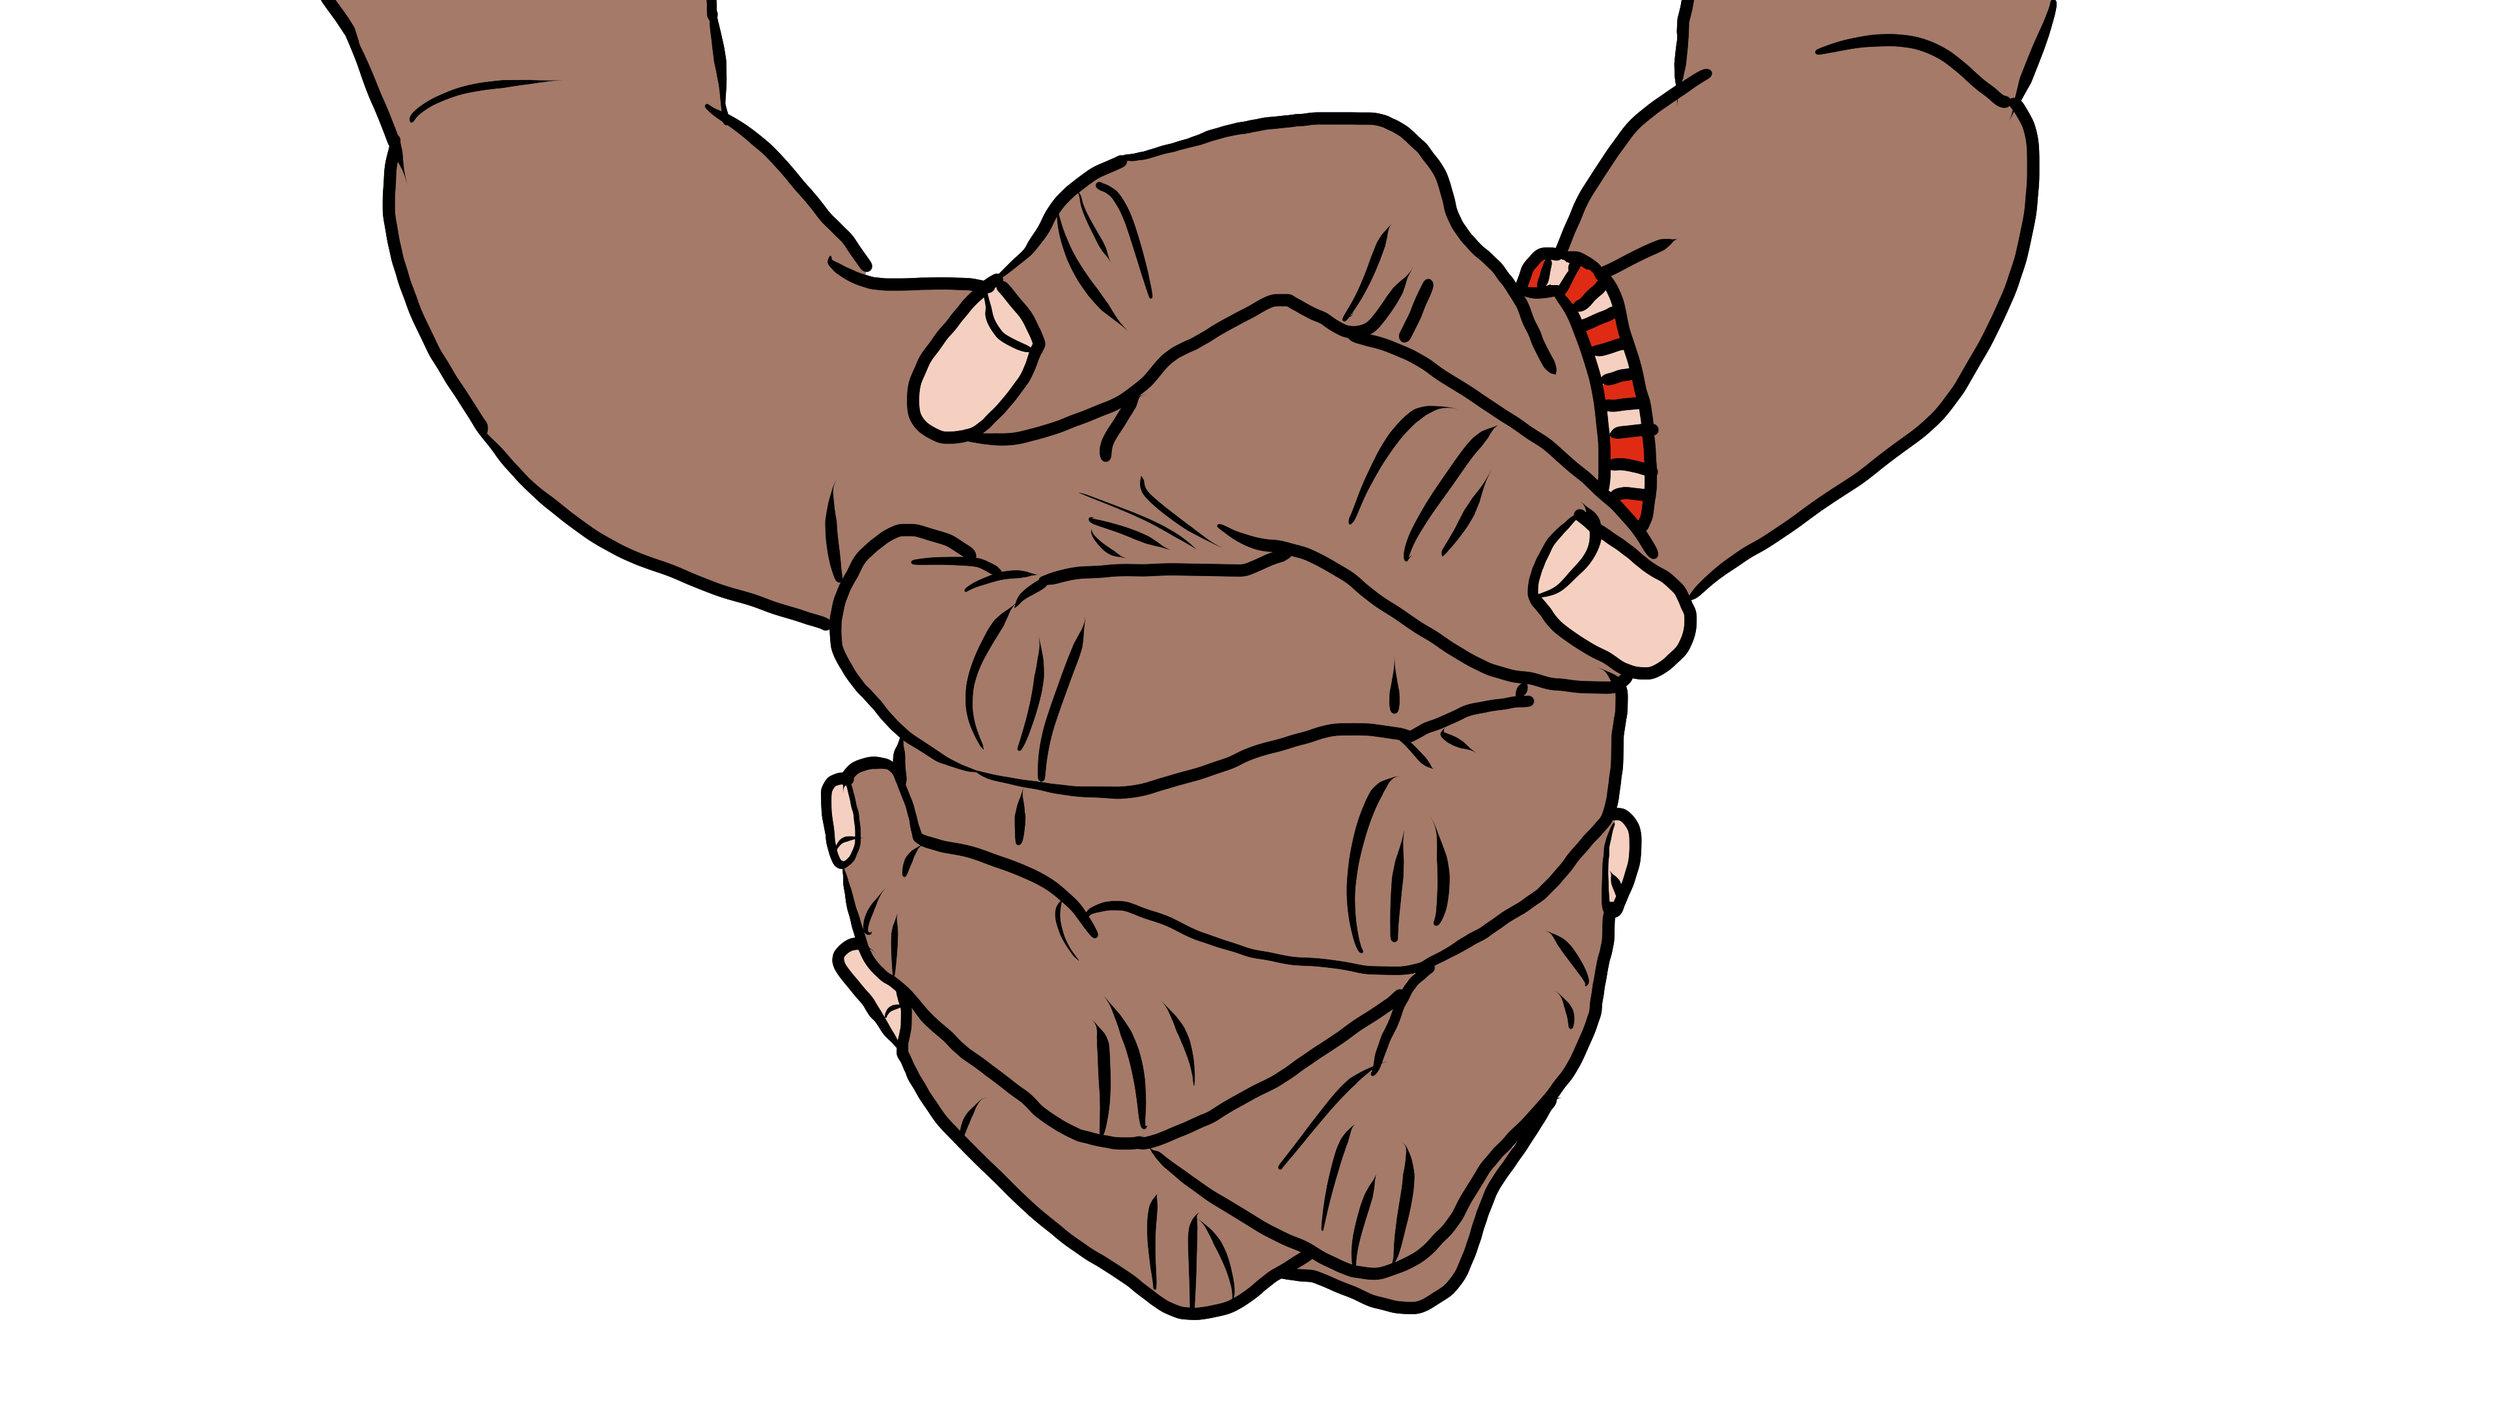 yoruba, nago, candomblé, wemilere, guemilere, tambores bata, iba, moforibale